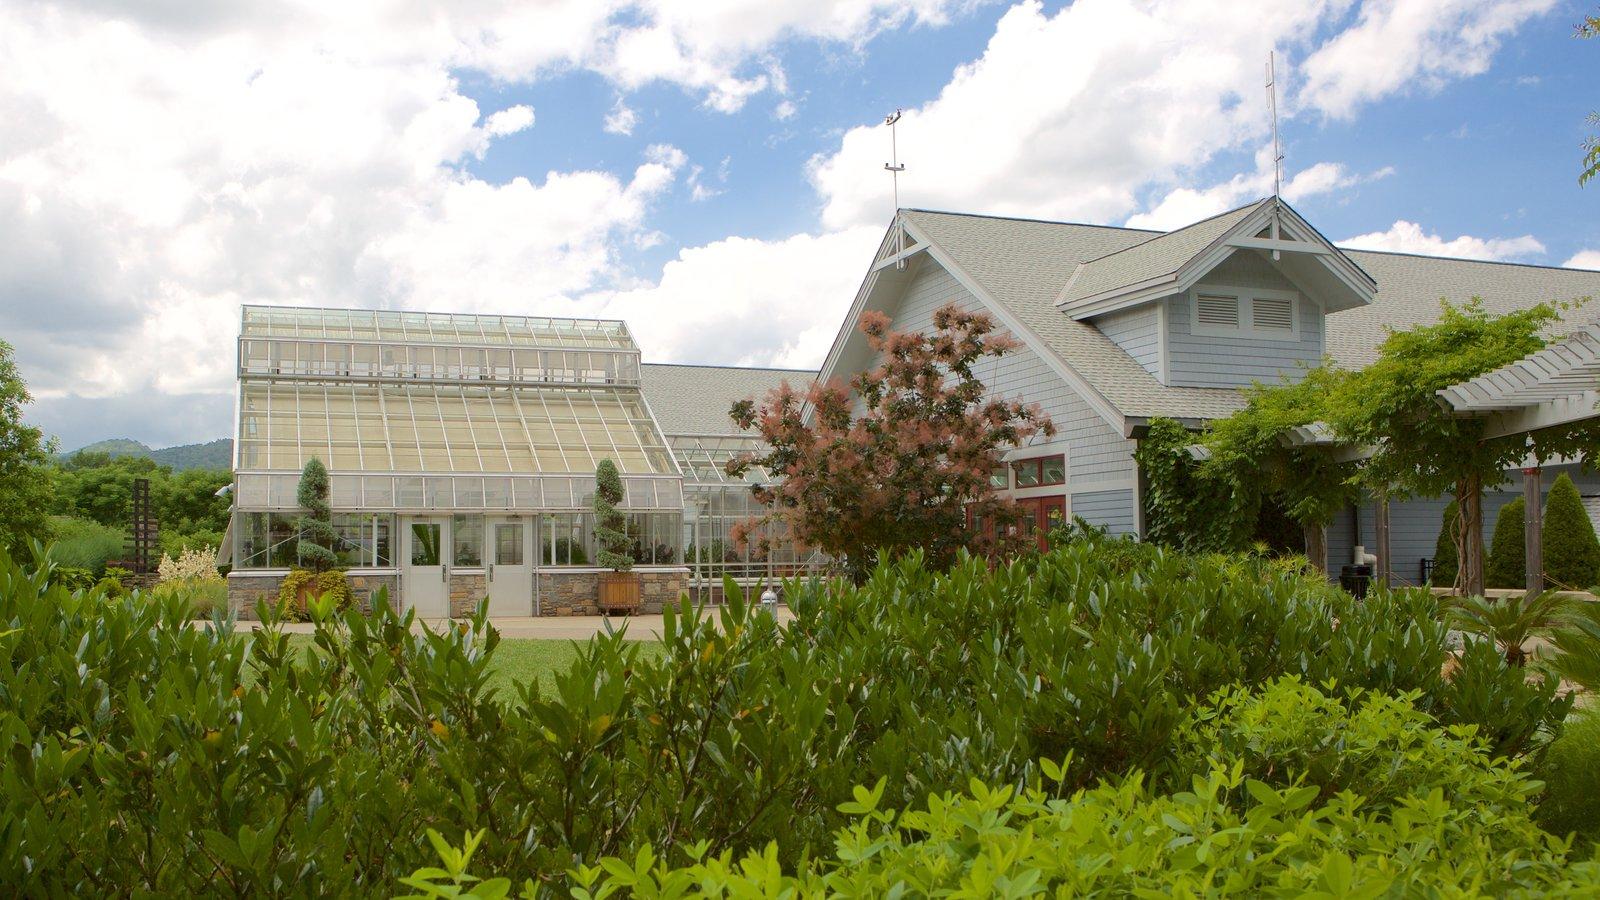 North Carolina Arboretum which includes a park